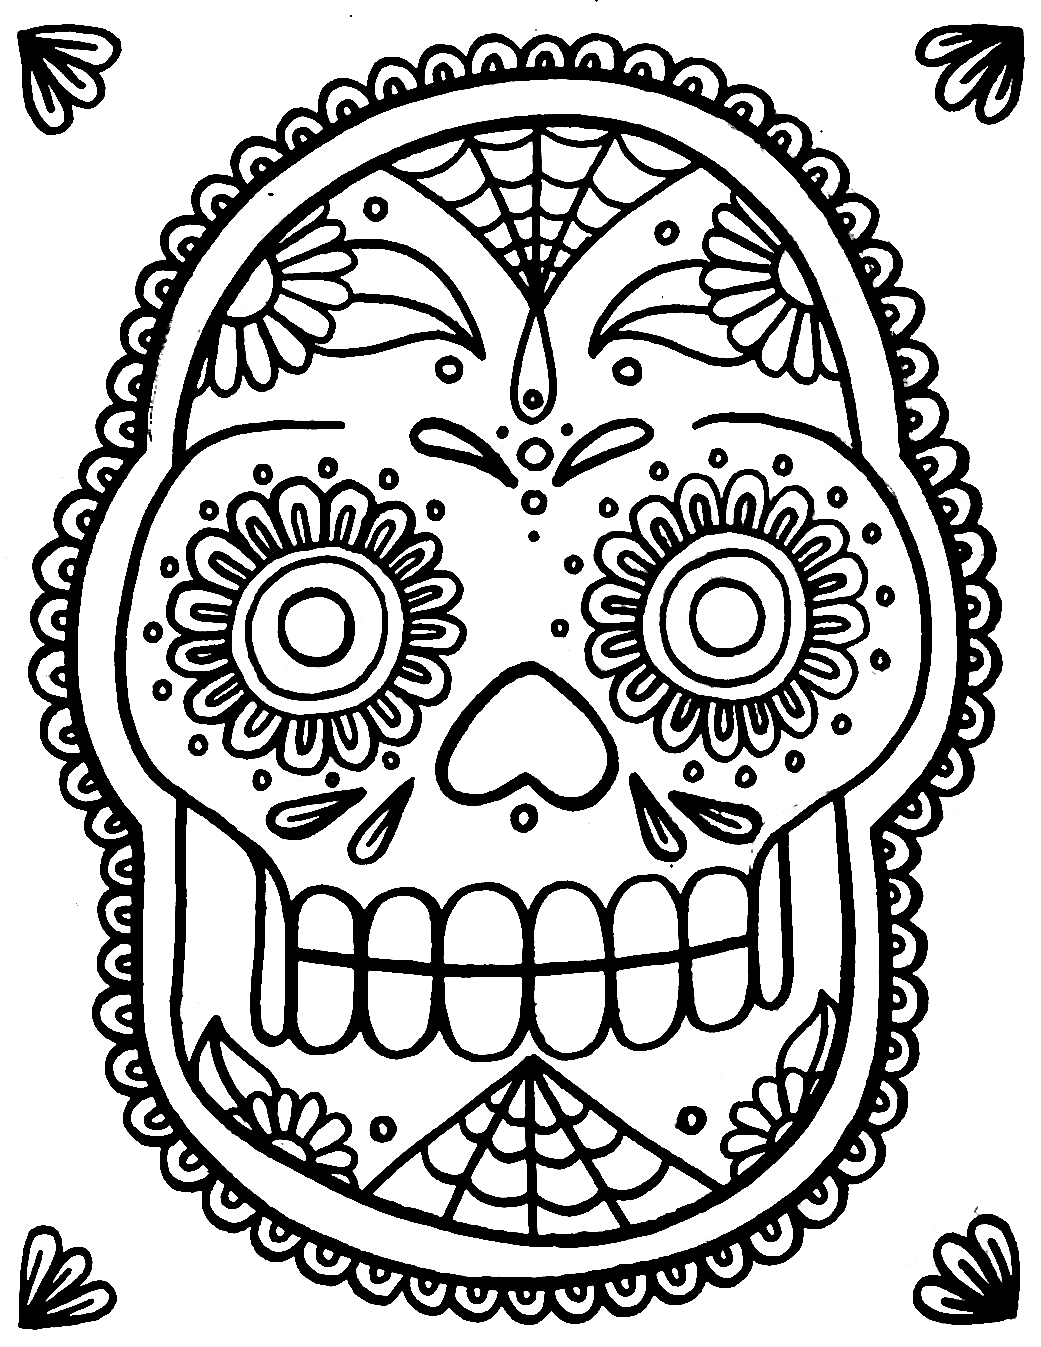 colorful sugar skull yucca flats nm wenchkin39s coloring pages sugar skull sugar colorful skull